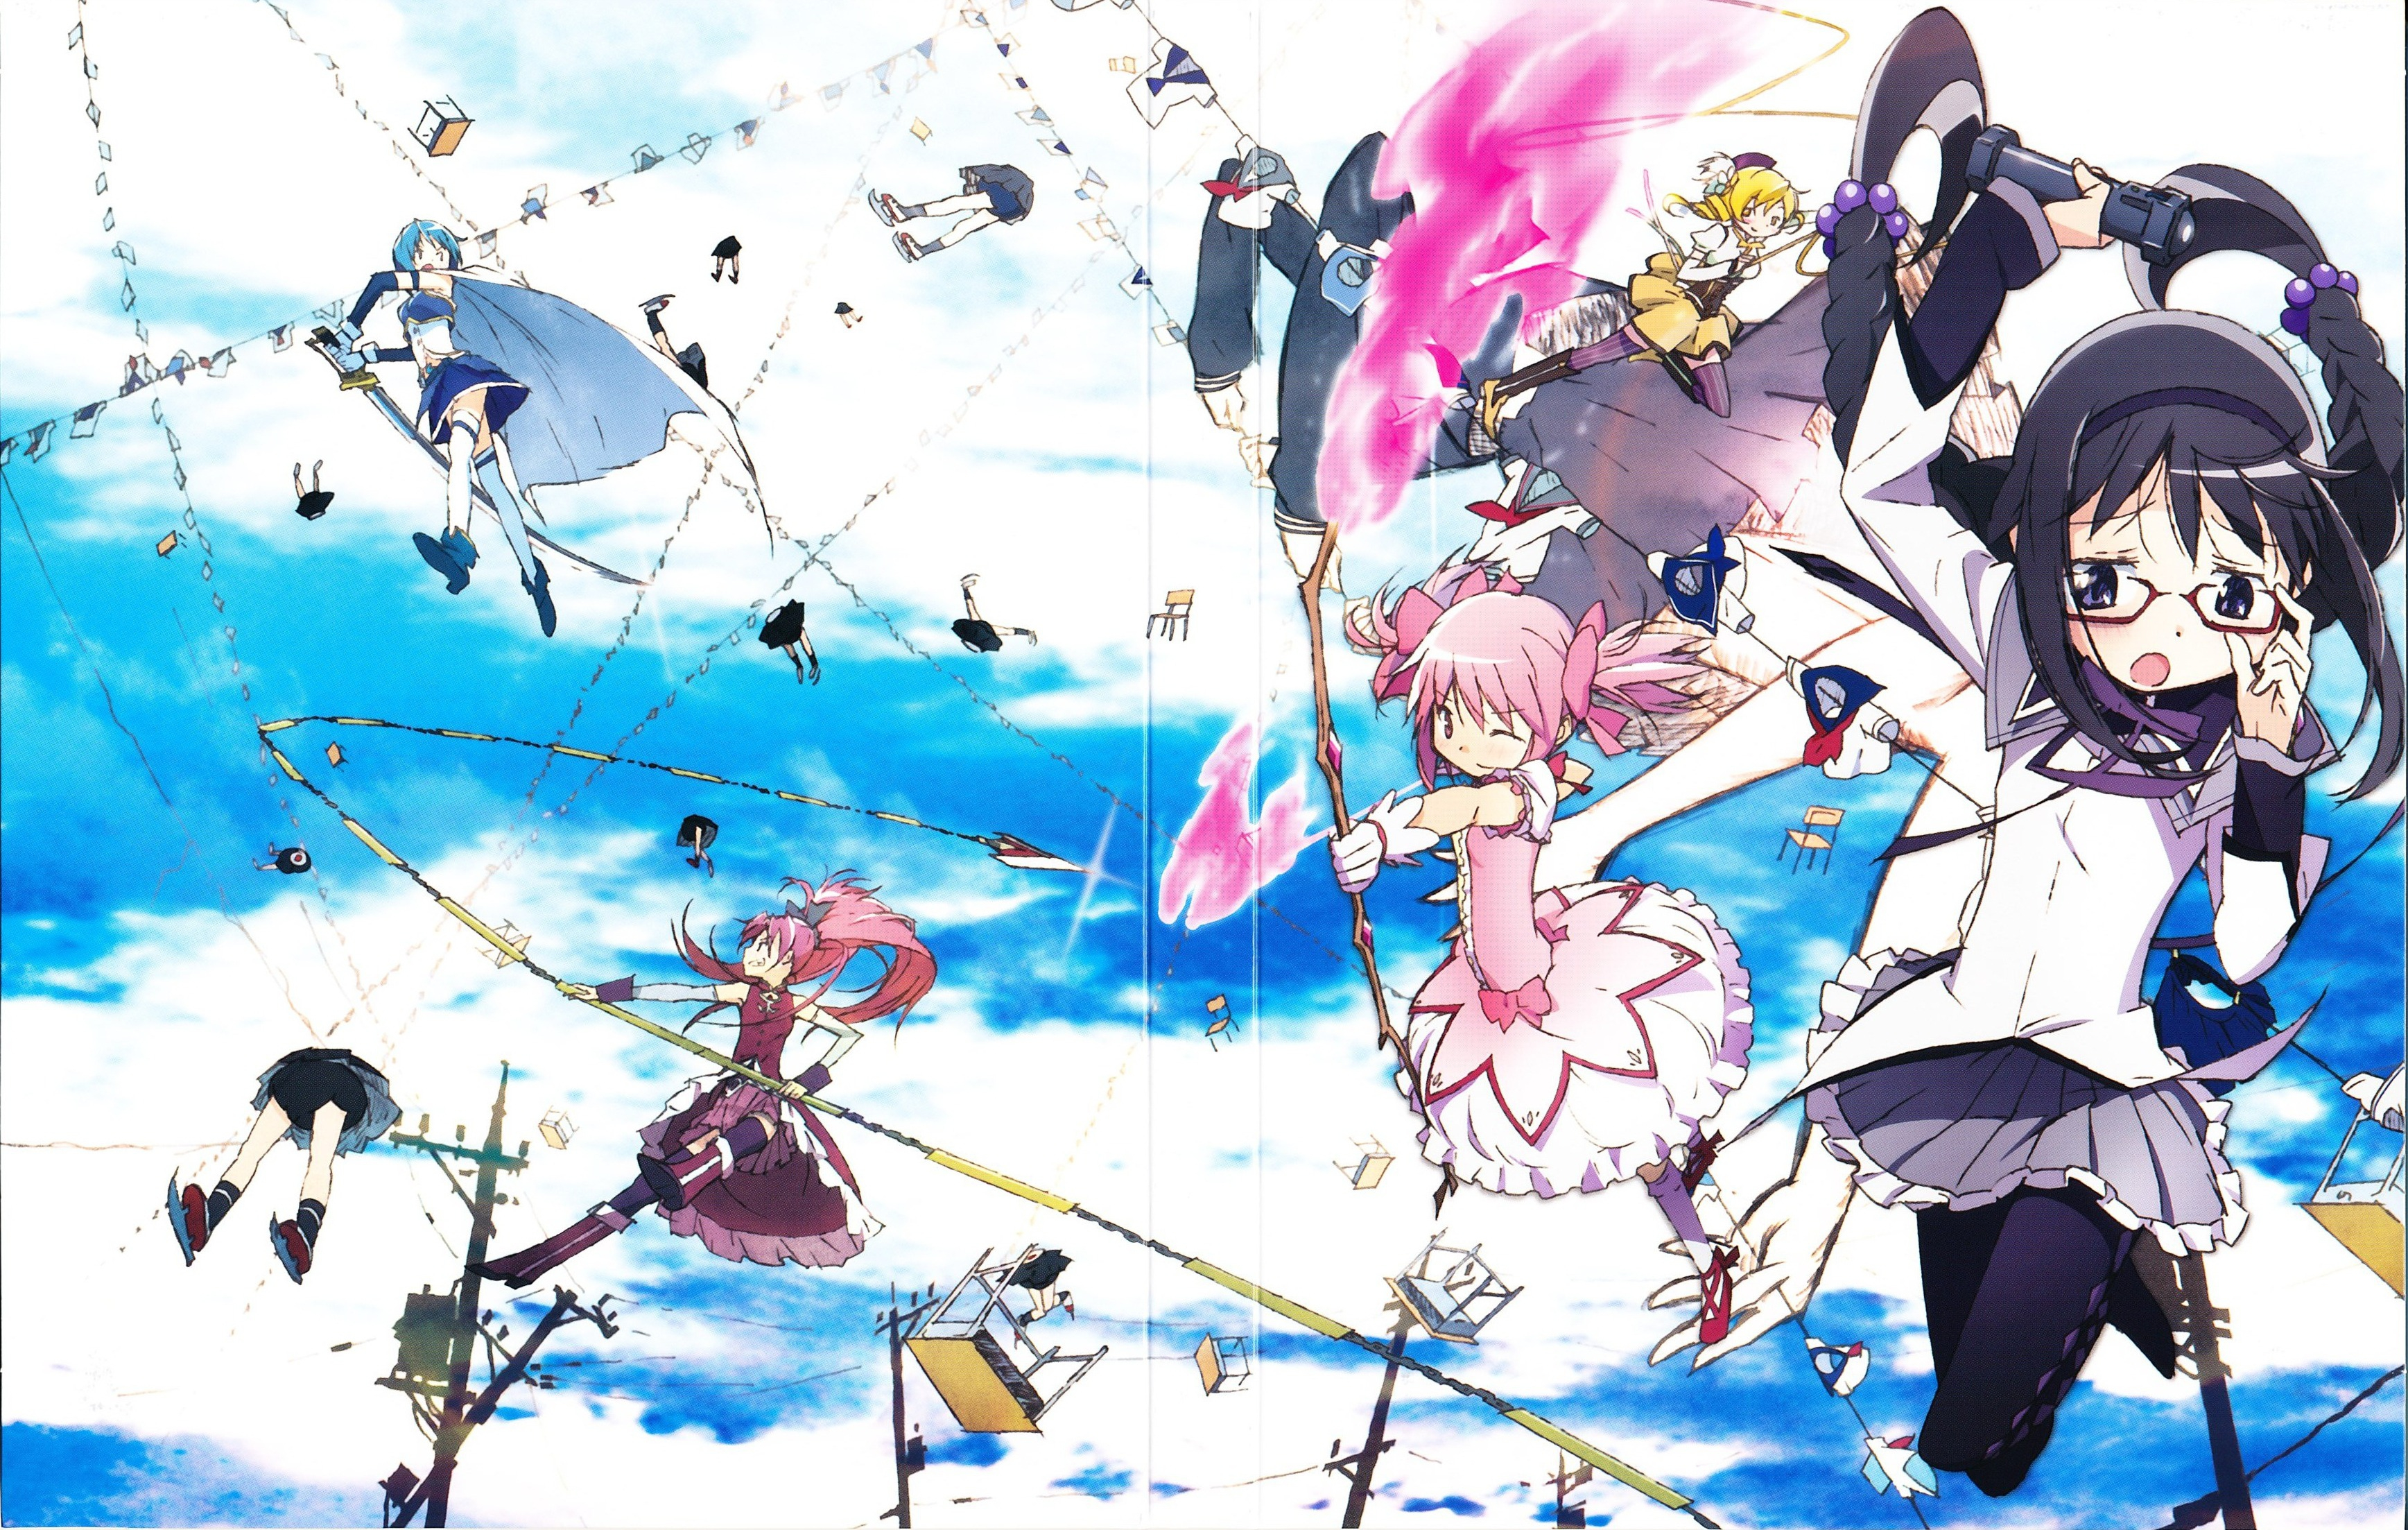 Patricia Mahou Shoujo Madoka Magica Zerochan Anime Image Board